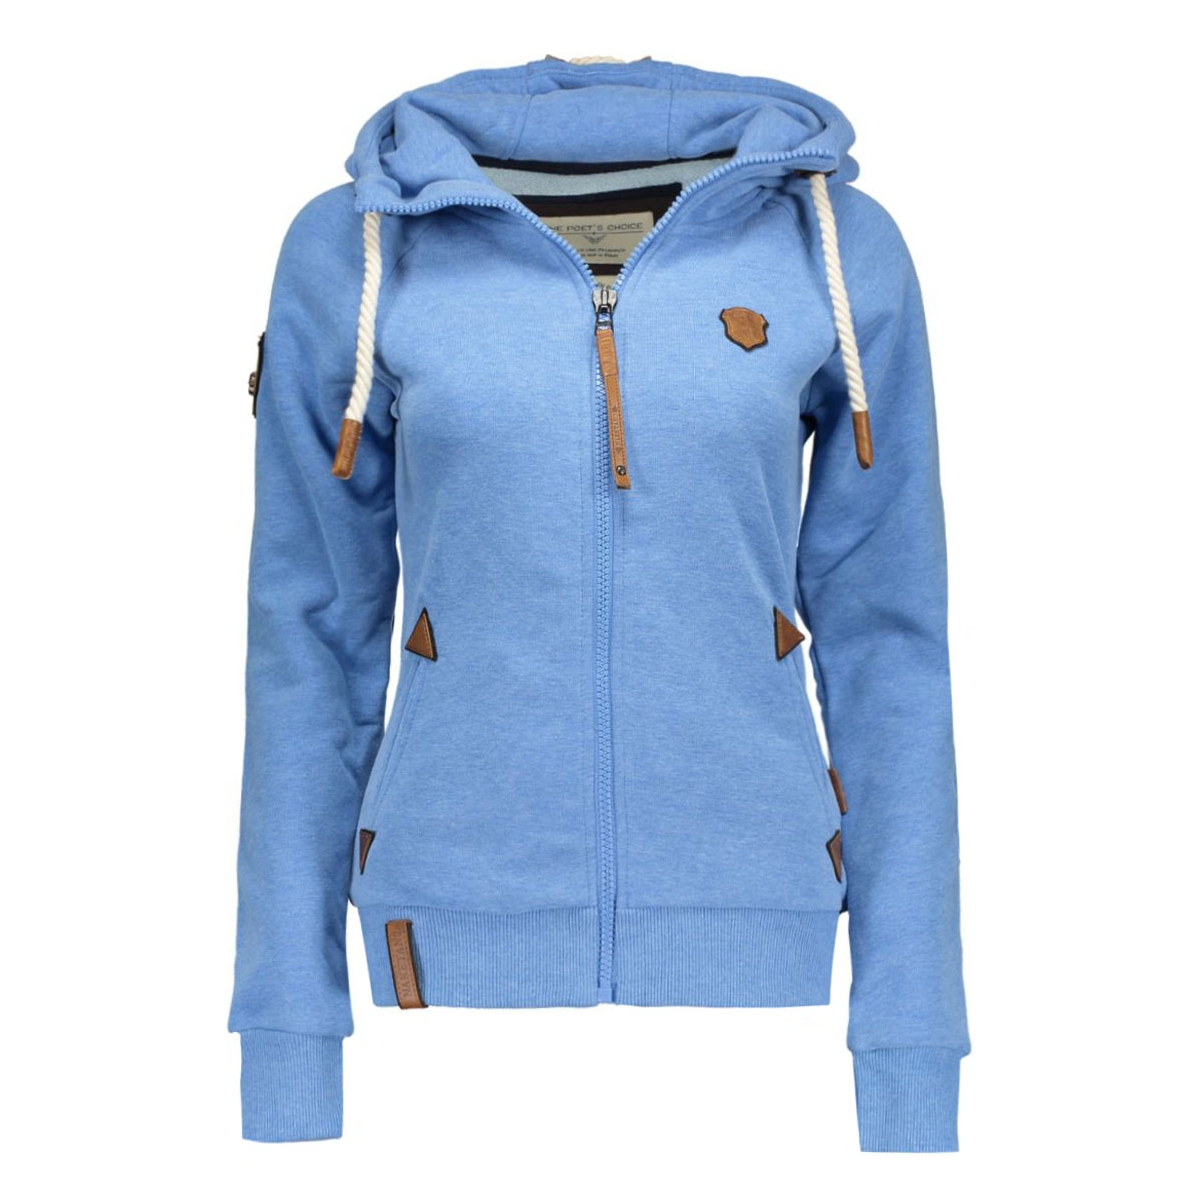 1601-0323 naketano vest sky blue